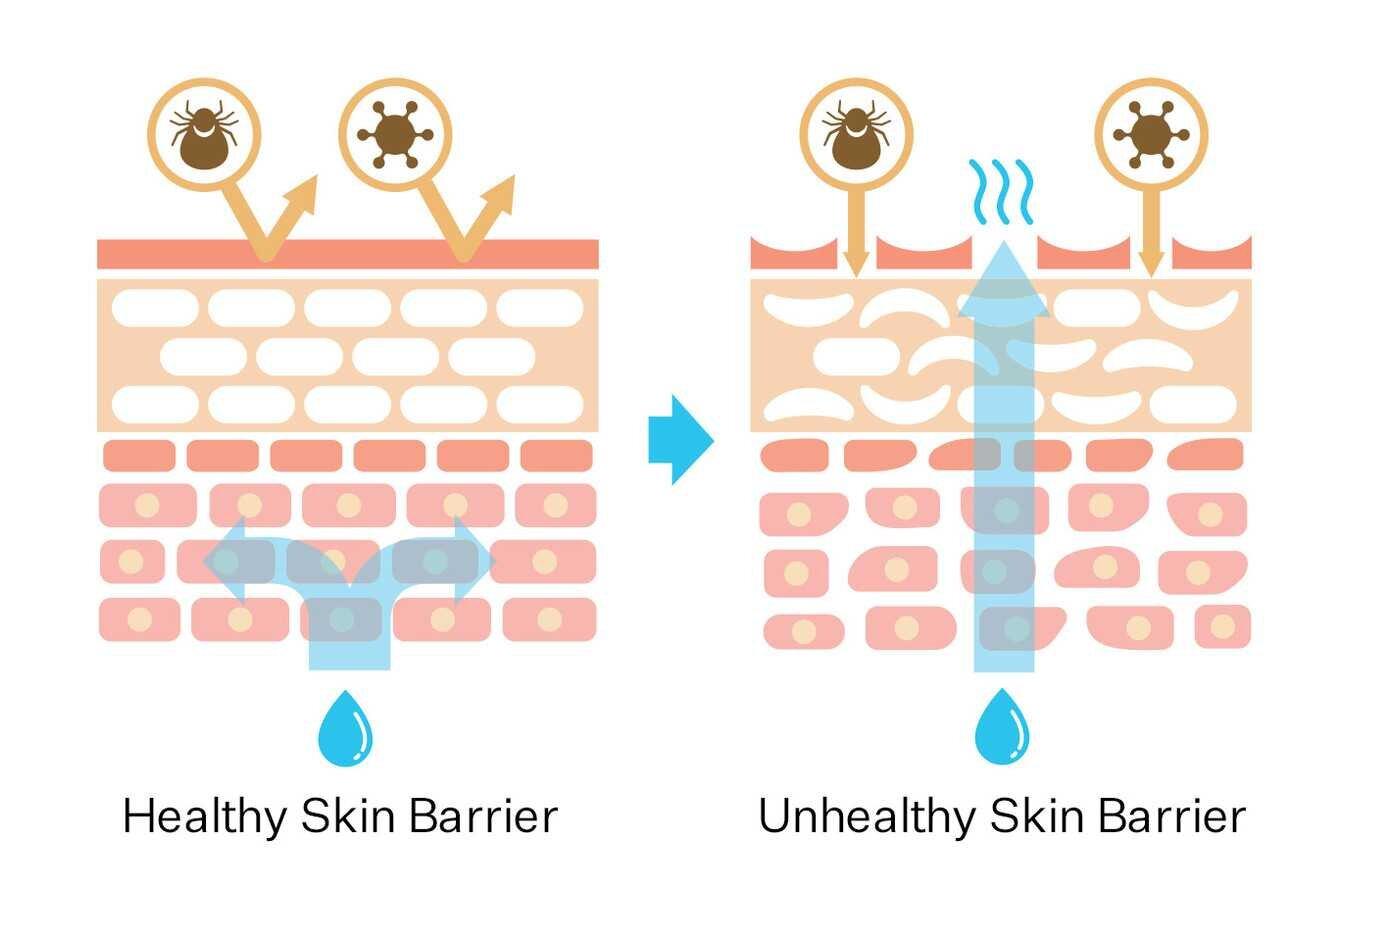 Skin Barrieris the key. - How can we repair skin barrier?